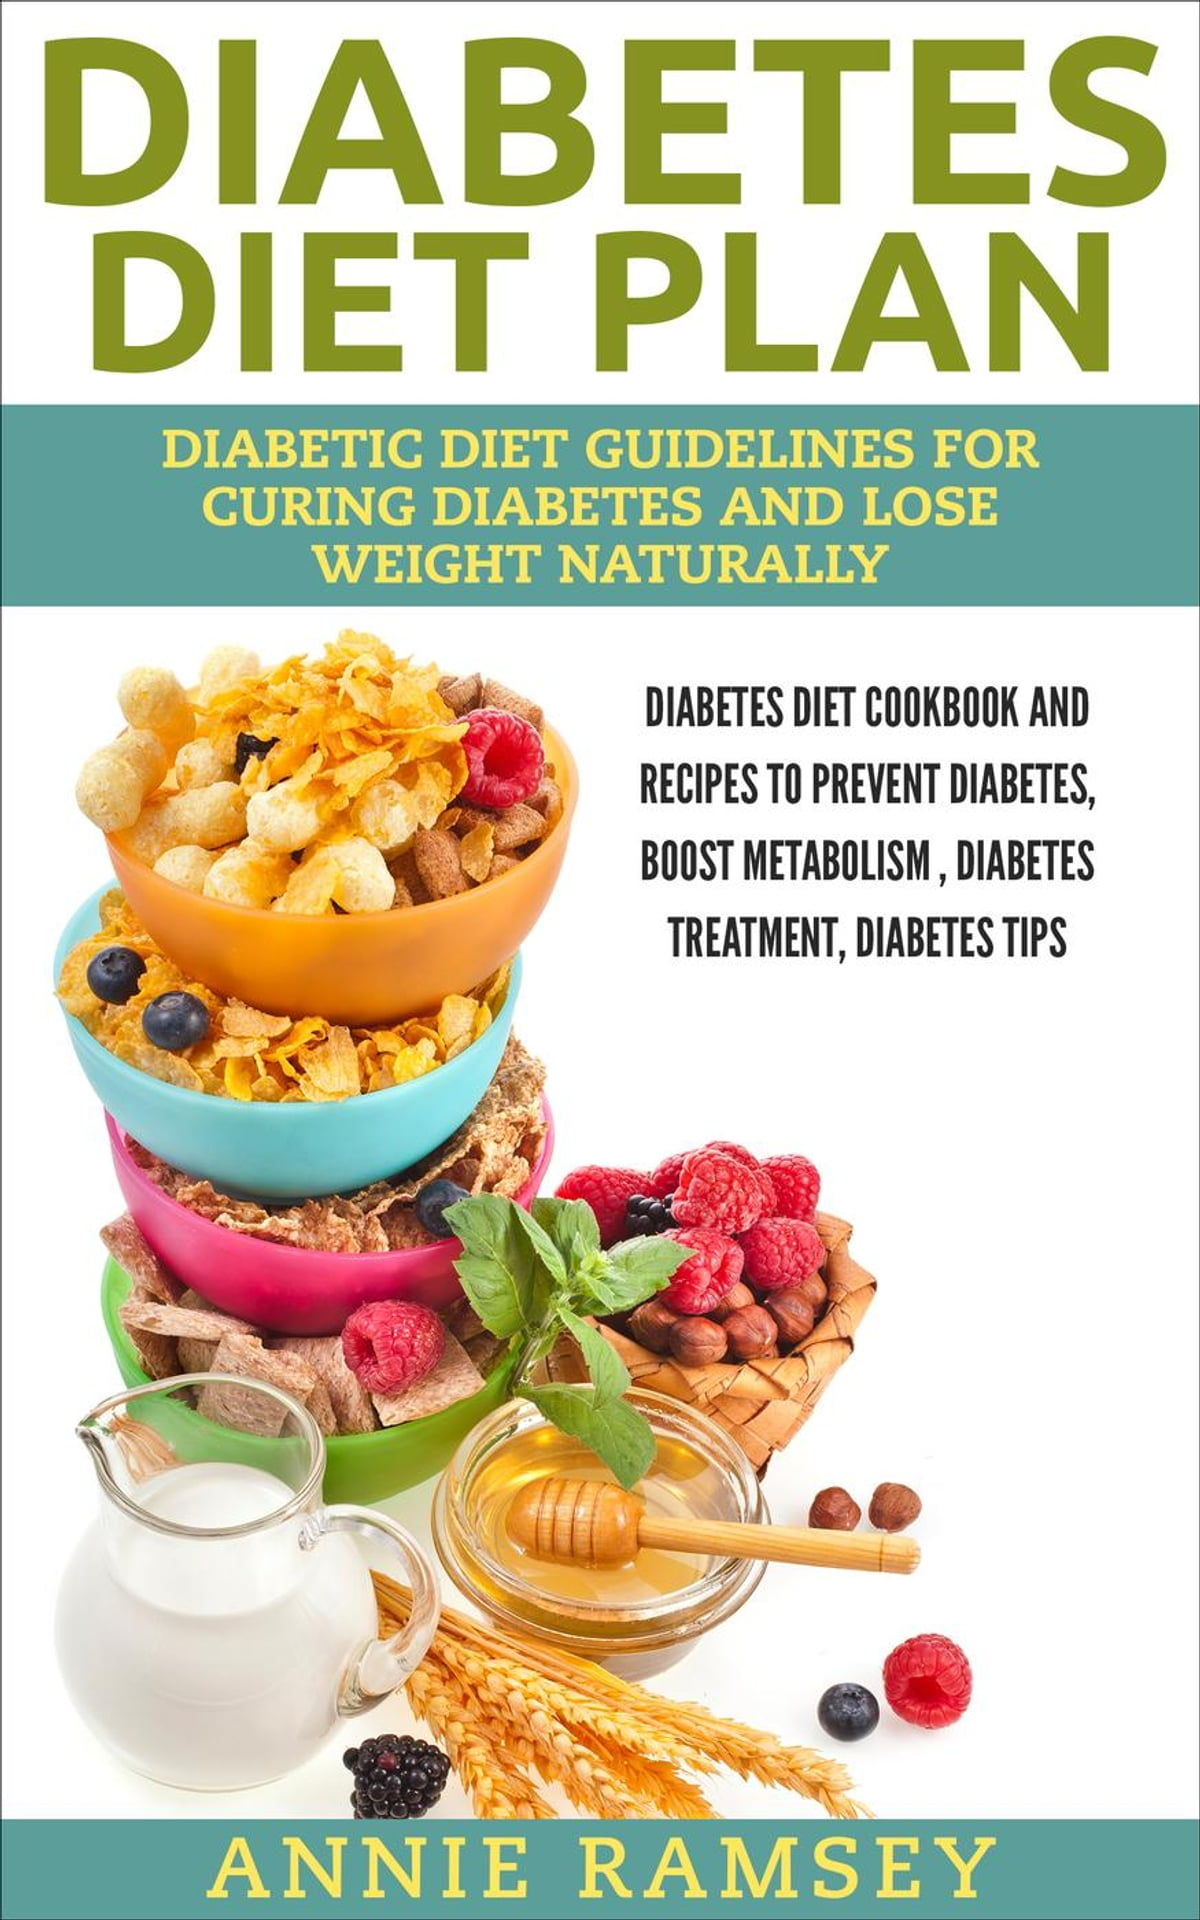 Diabetest Plan Diabetict Guidelines For Curing